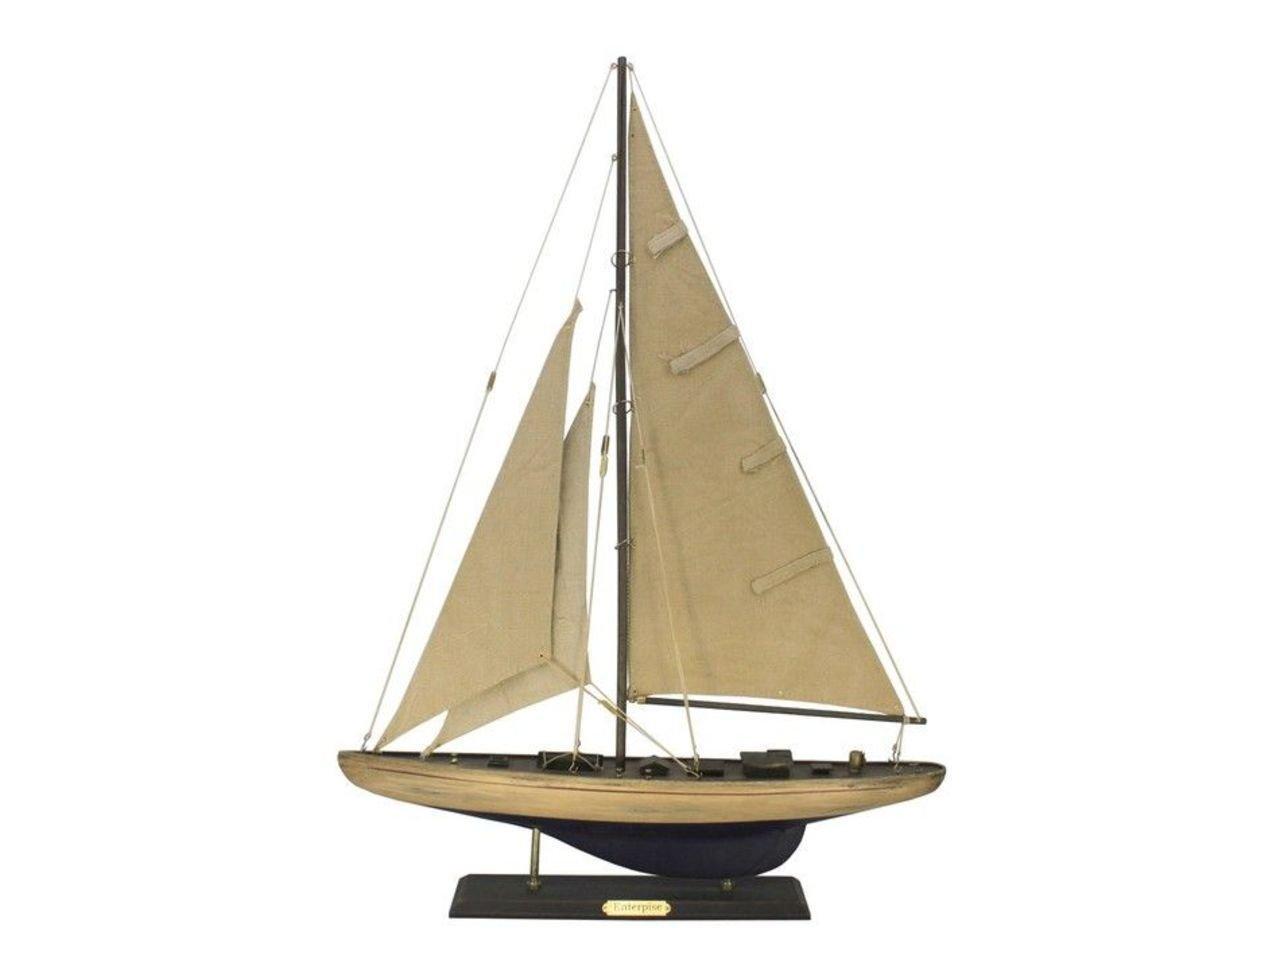 Hampton Nautical  Wooden Rustic Enterprise Sailing Yacht Limited 27''- Nautical Home Decorating - Nautical Gift Toy Figure